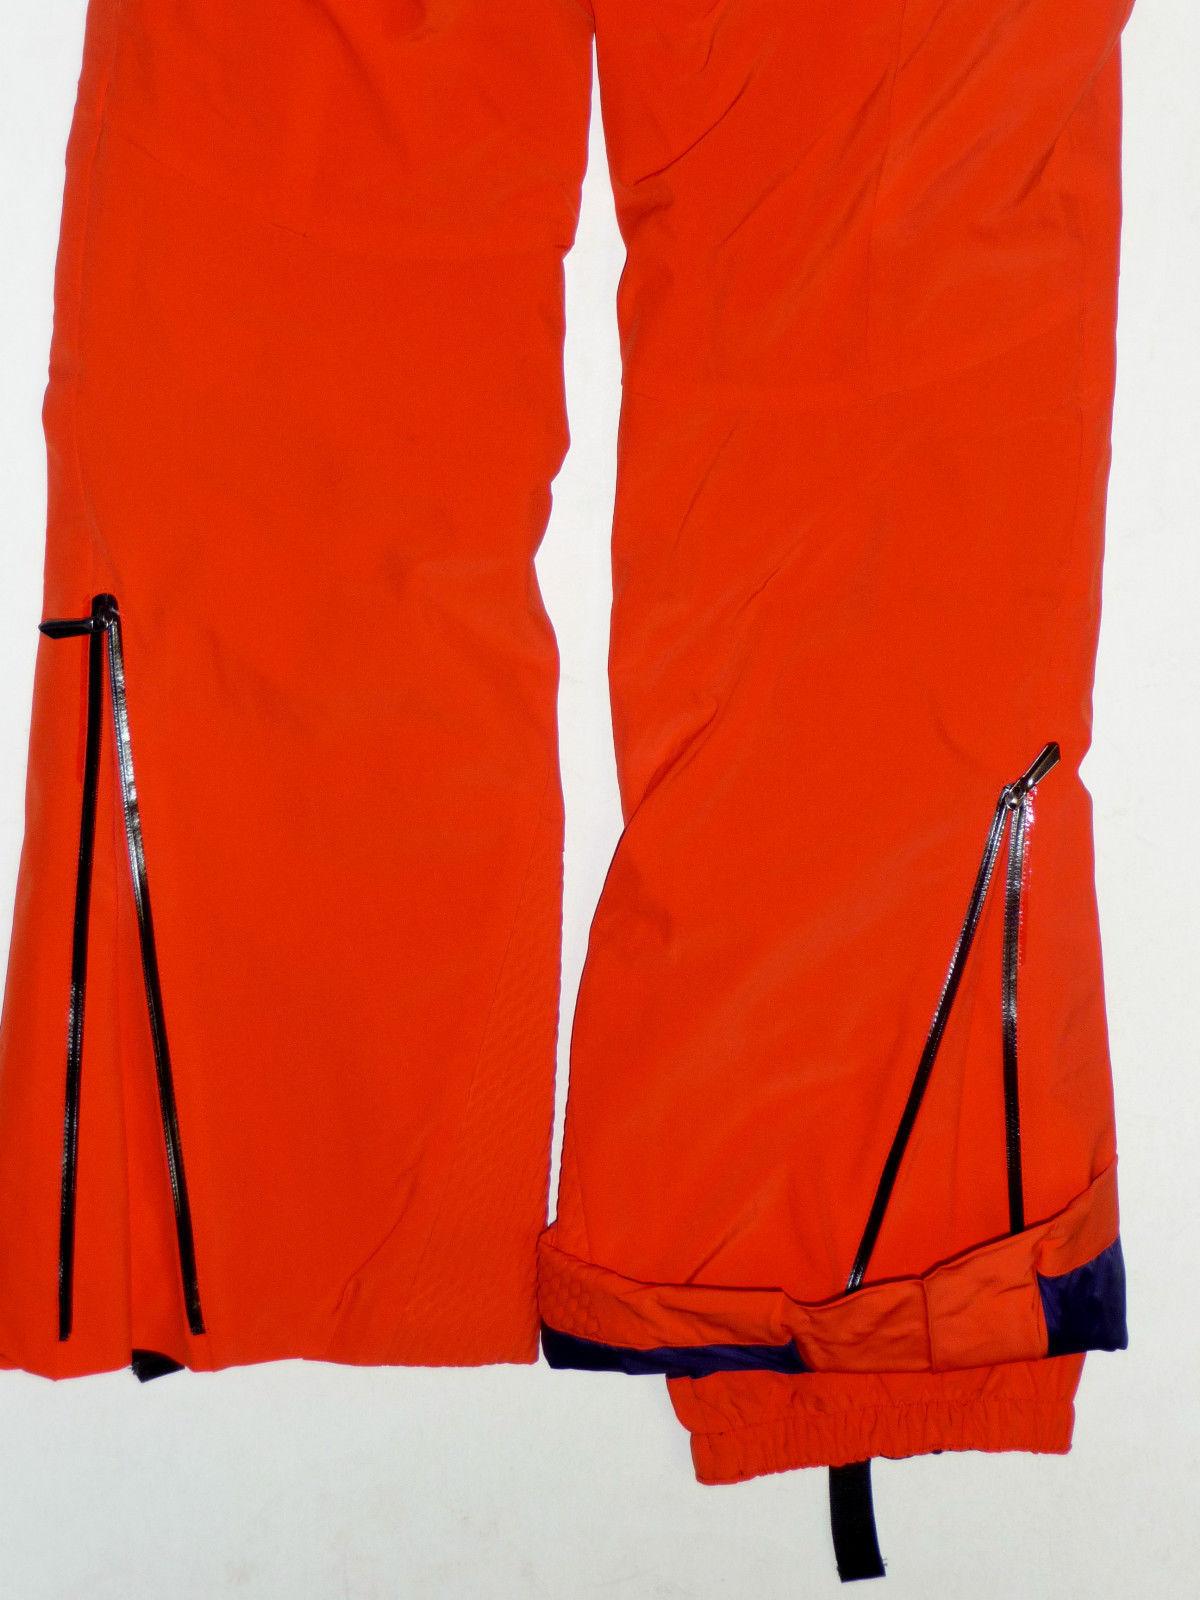 Spyder Ruby Pants Womens Ski Snowboard 20k Waterproof Insulated Orange 6 $400 image 6